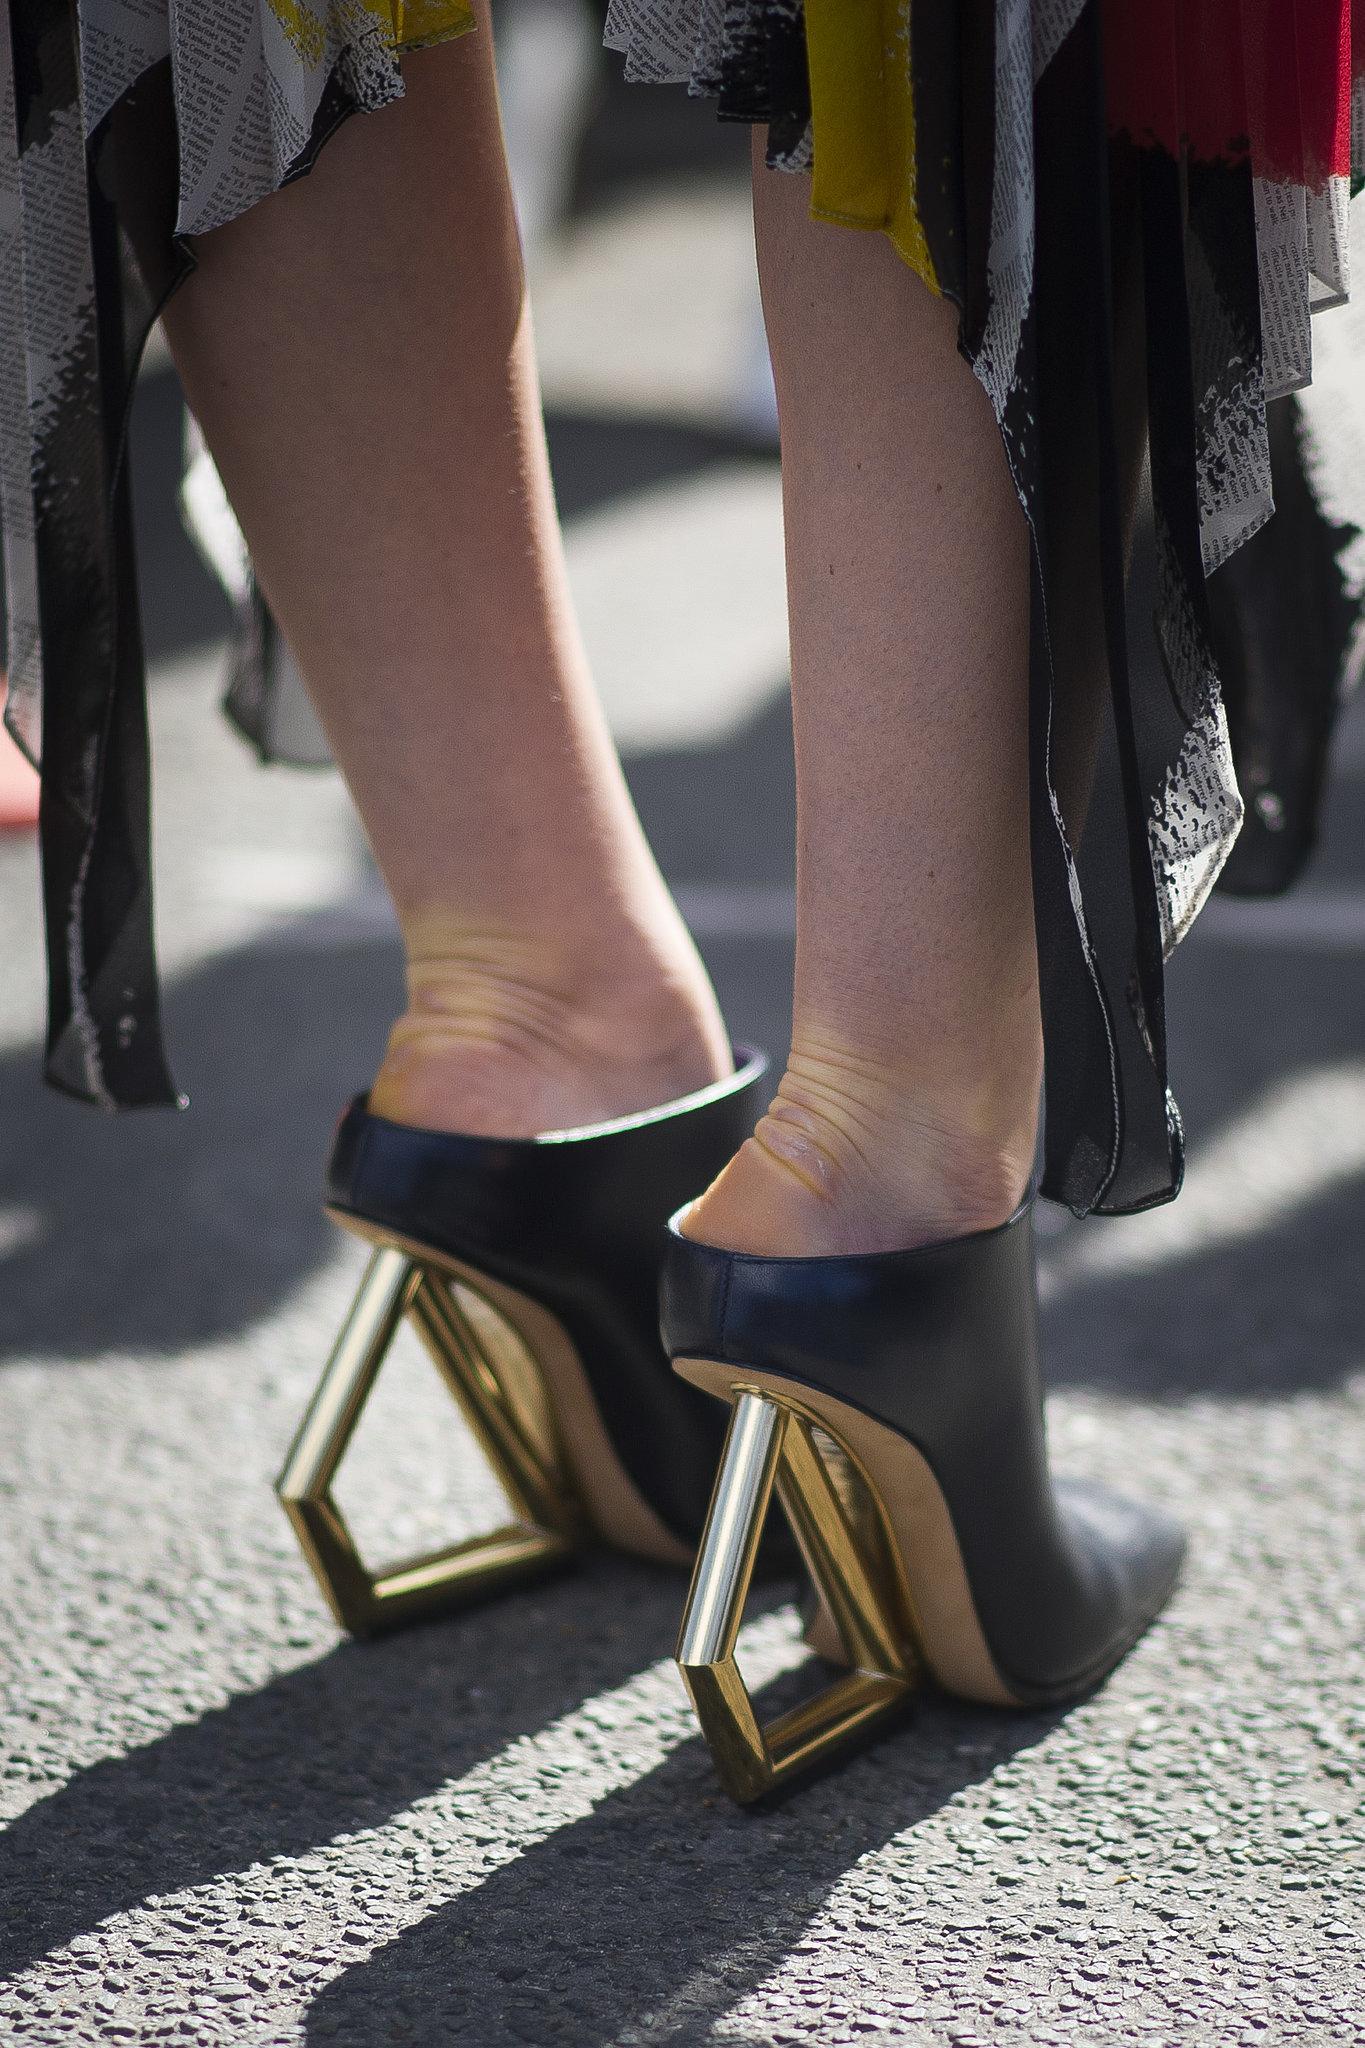 Celine Wooden Heeled Shoe